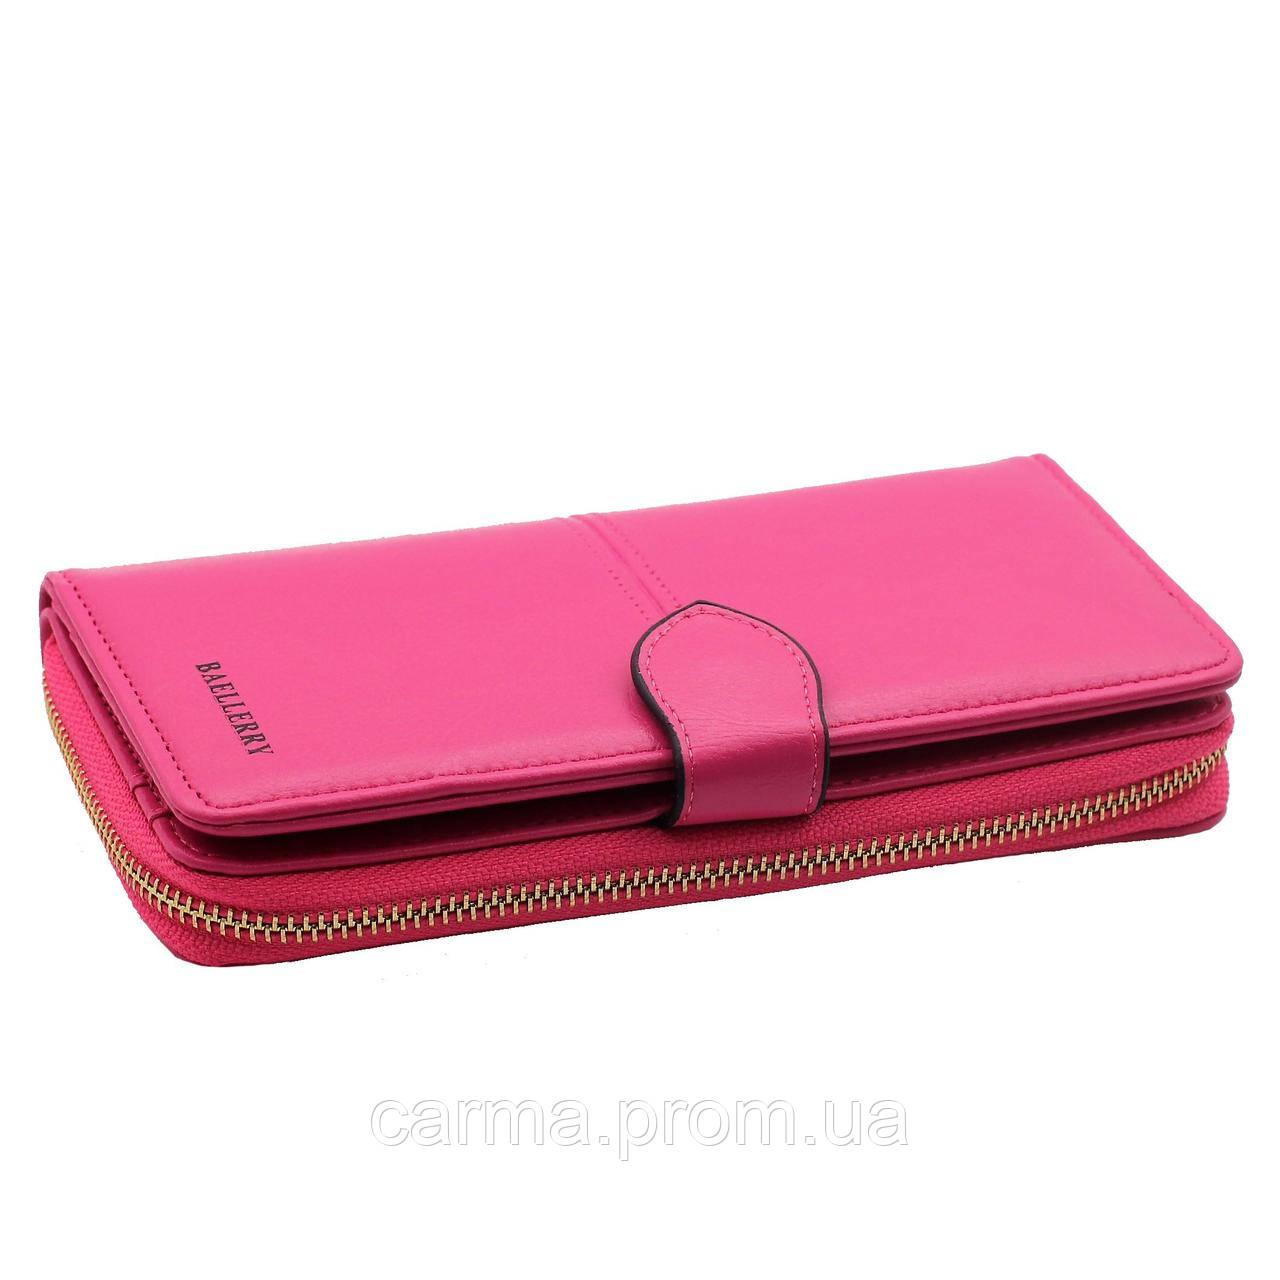 Кошелек женский Baellerry N3846 Розовый